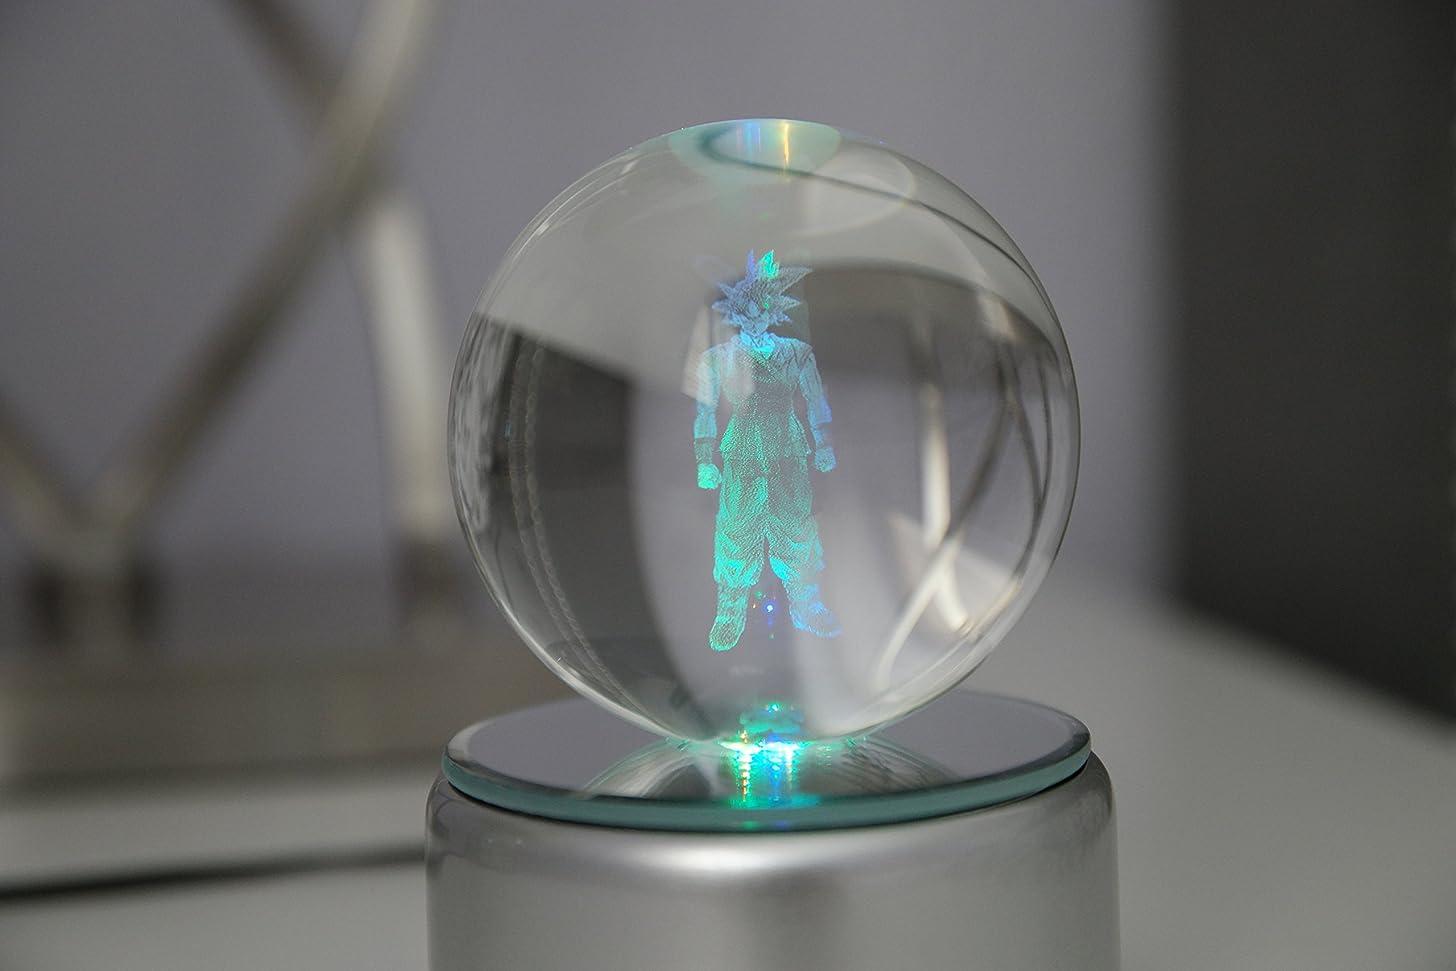 Dragon Ball Z Super K9 Crystal Ball 3D LED Rotating Night Light Laser Engraved Changes Colors (Goku 1 Star)